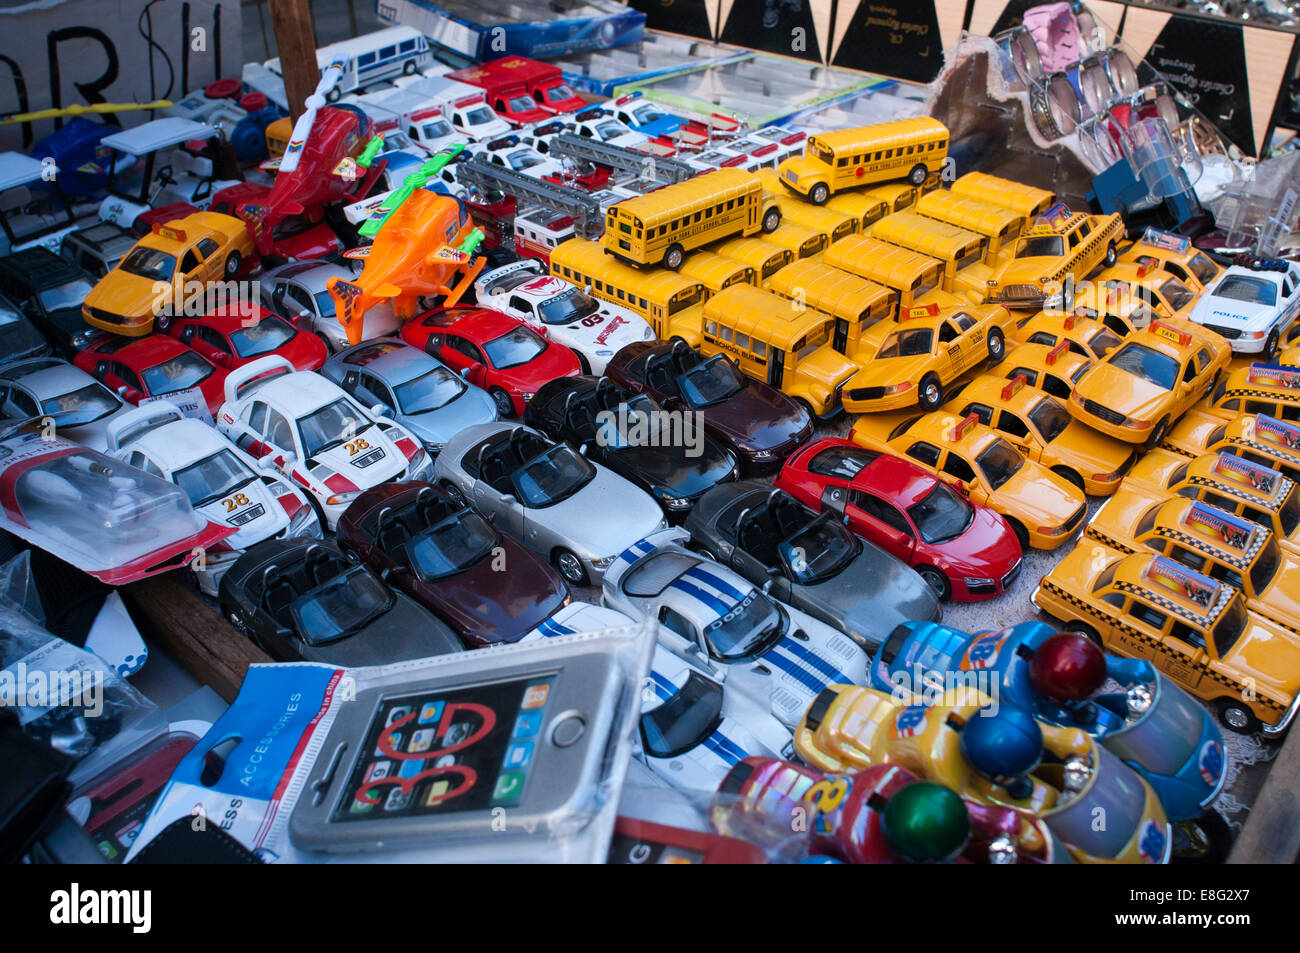 SOUVENIRS GIFT SHOP WINDOW MANHATTAN NEW YORK CITY USA. Toy cars ...